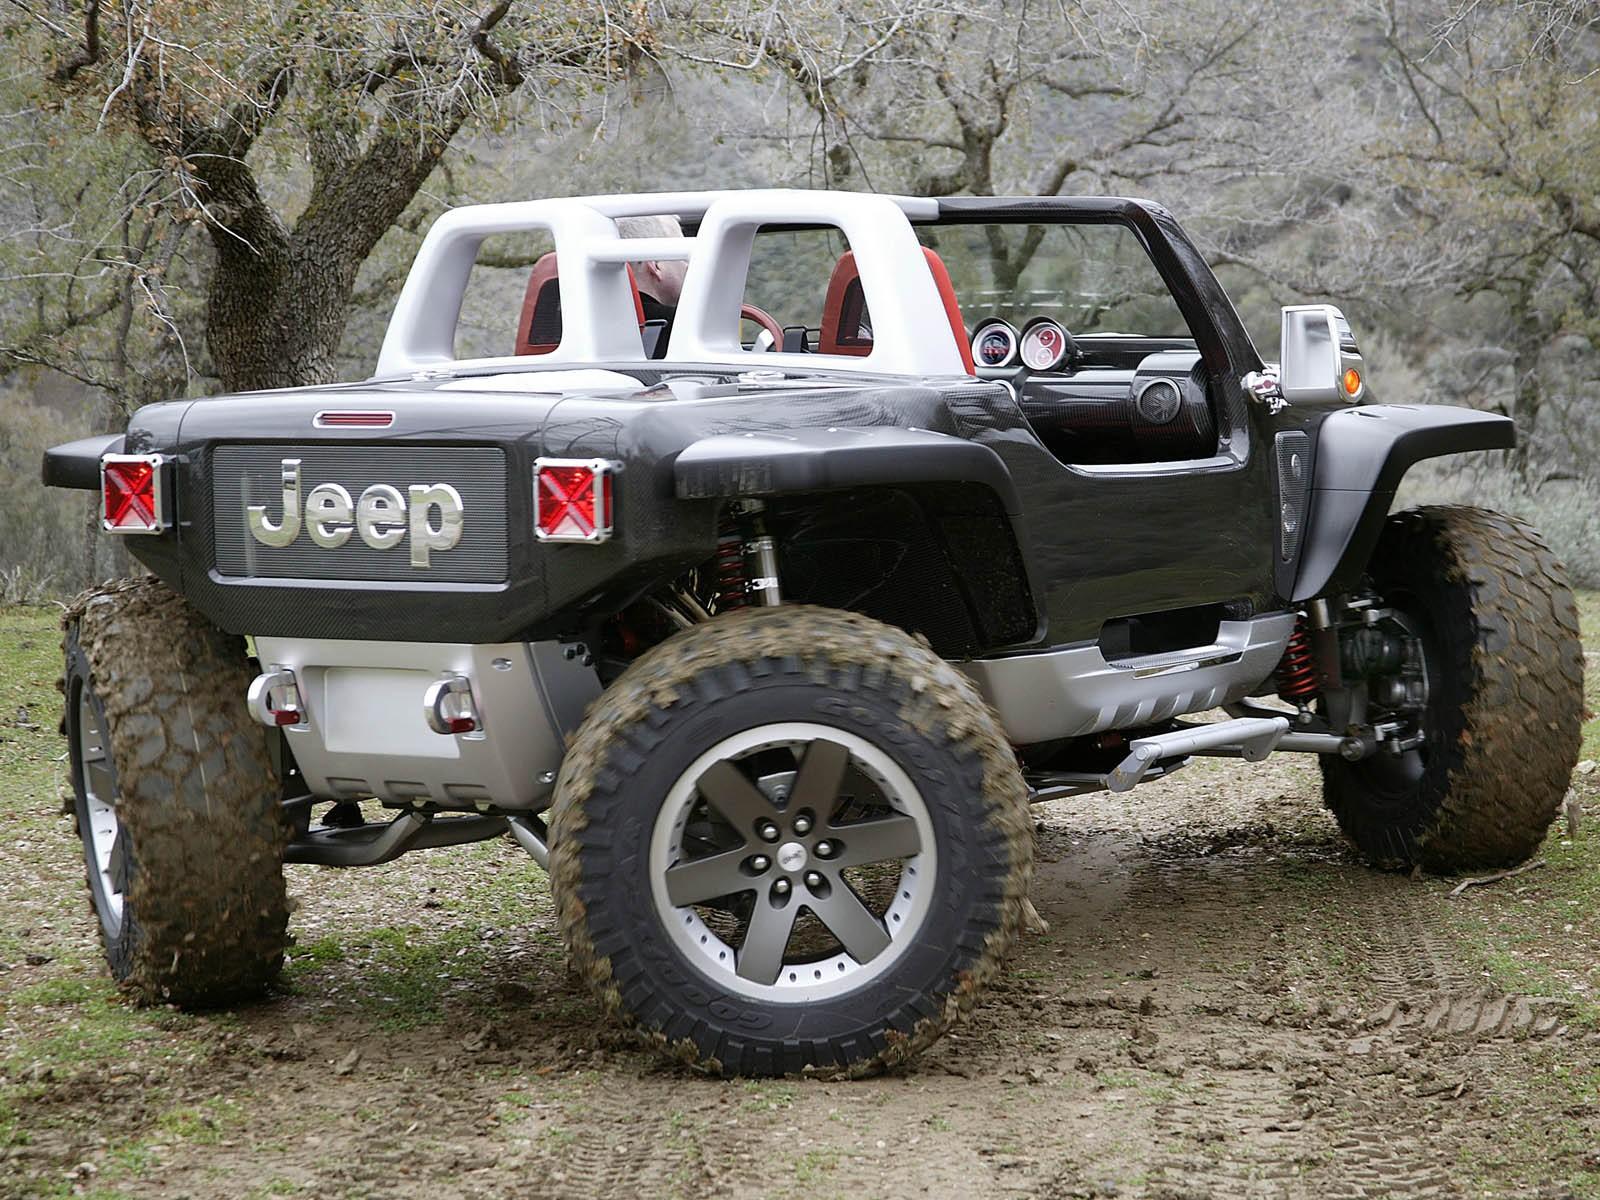 jeep越野车图片大全图片